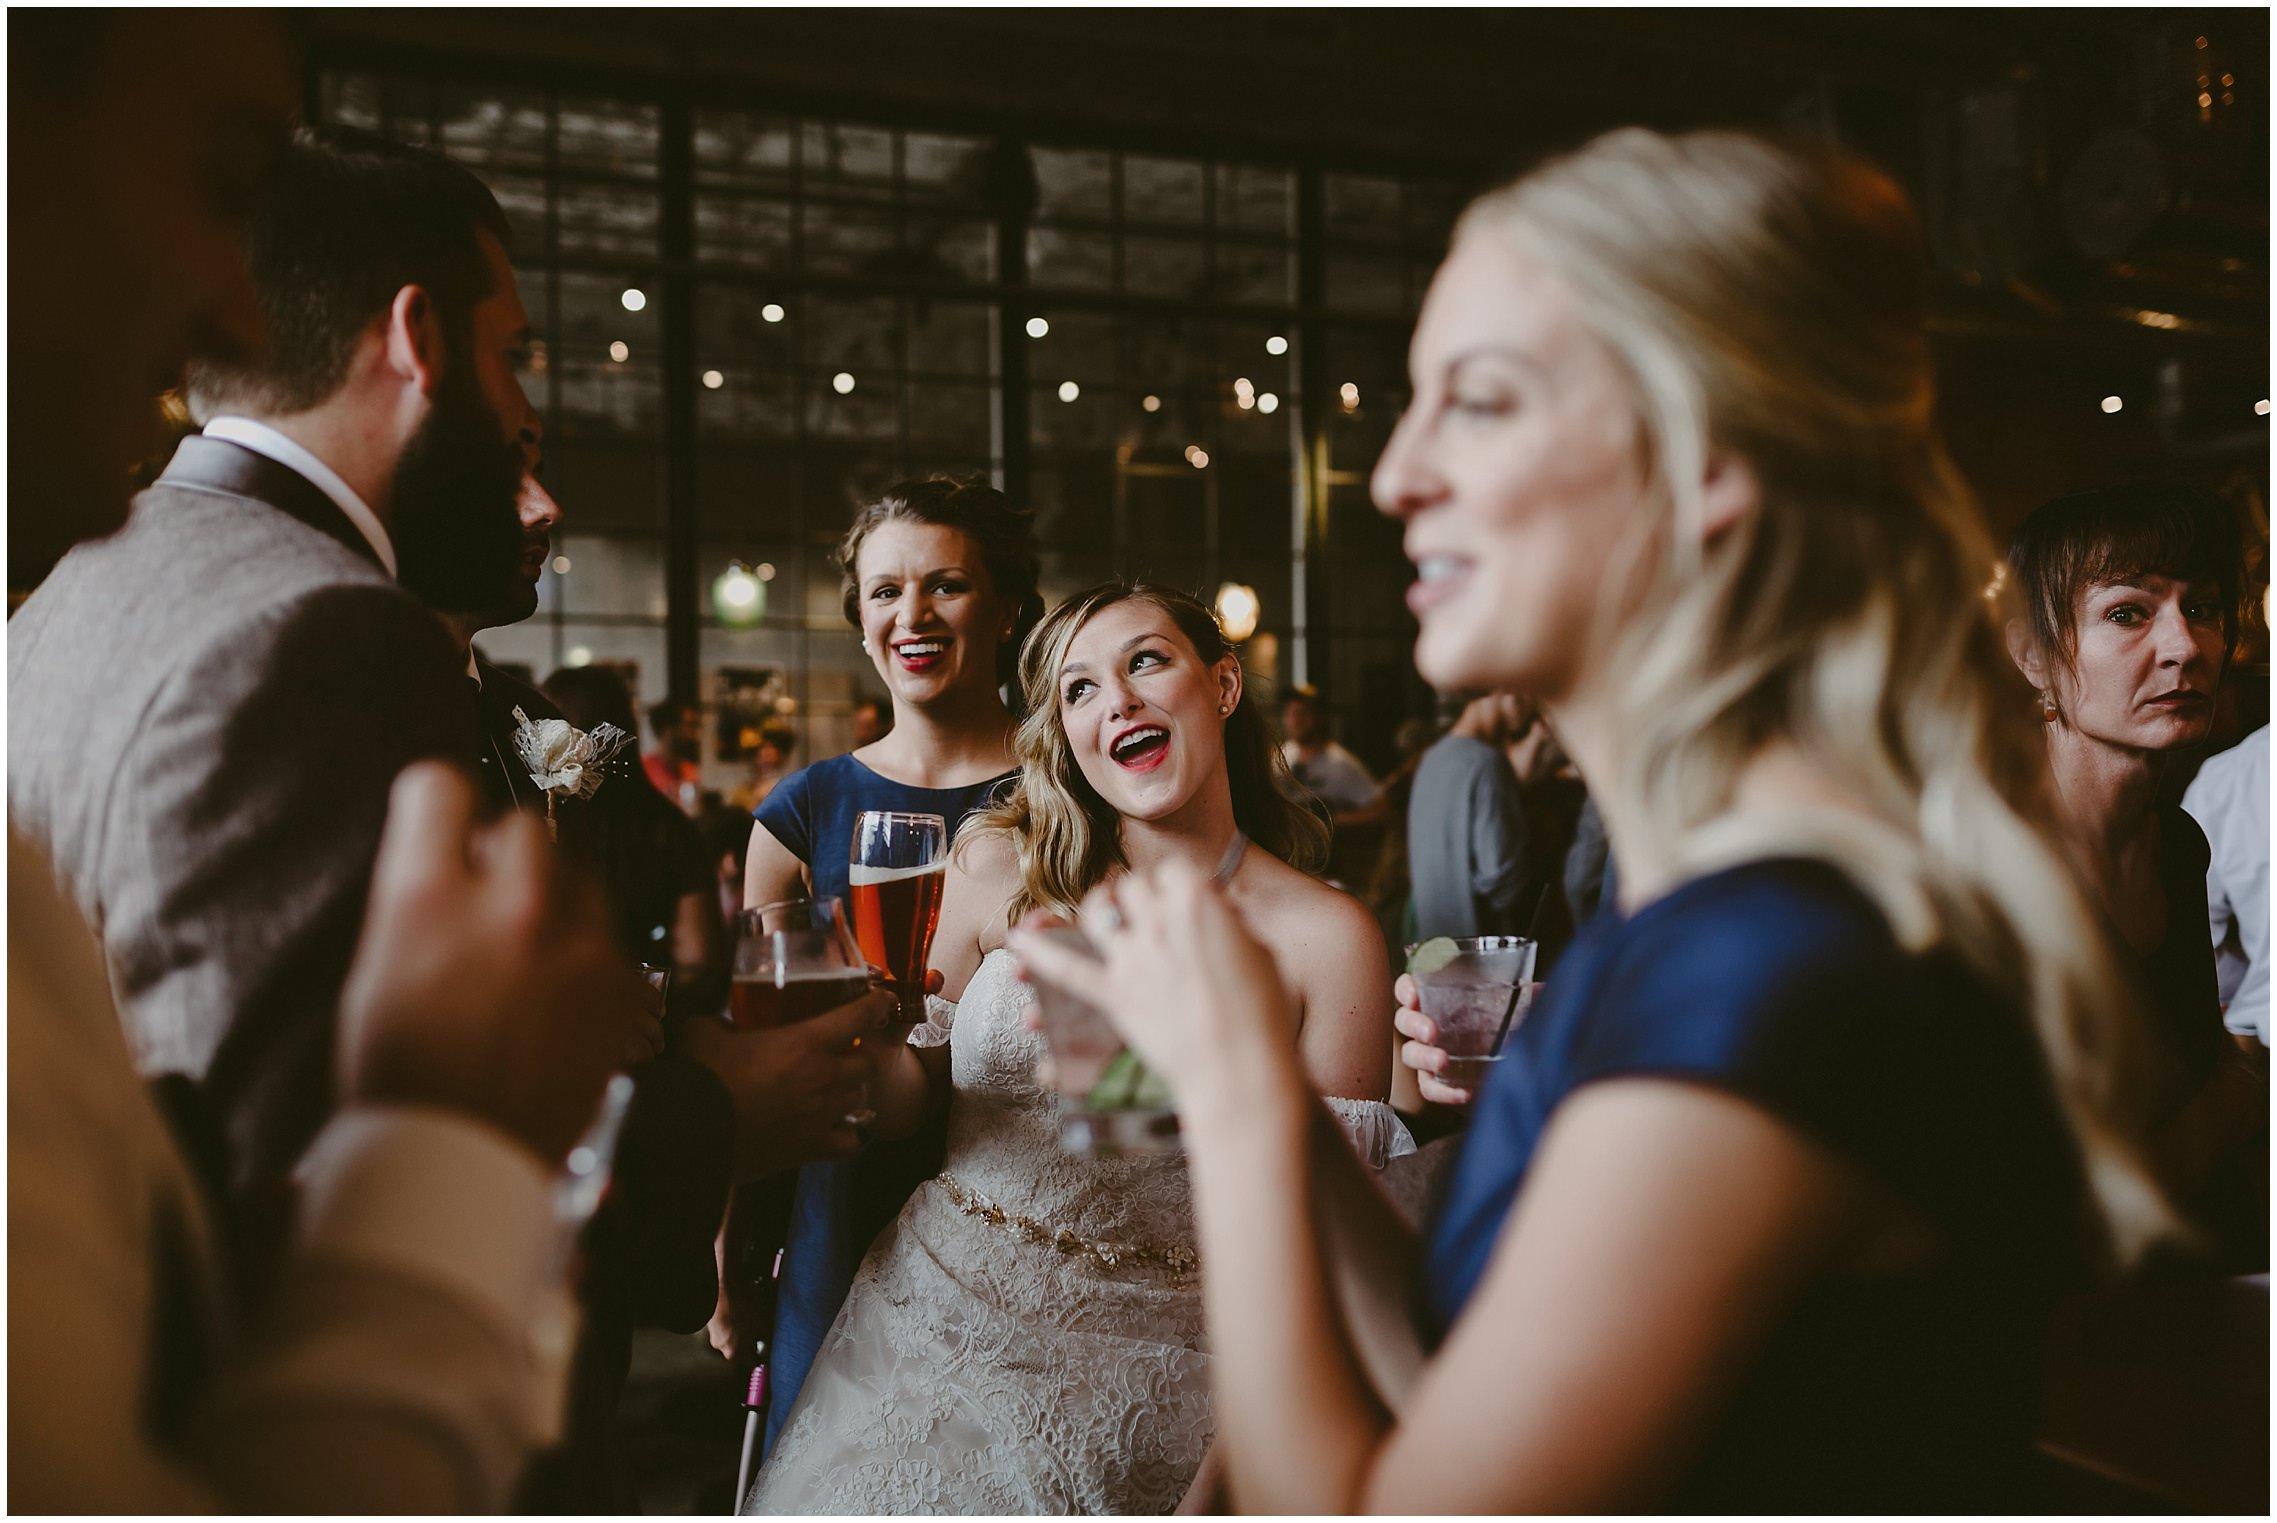 brick_and_mortar_colorado_wedding_photographer_0245.jpg